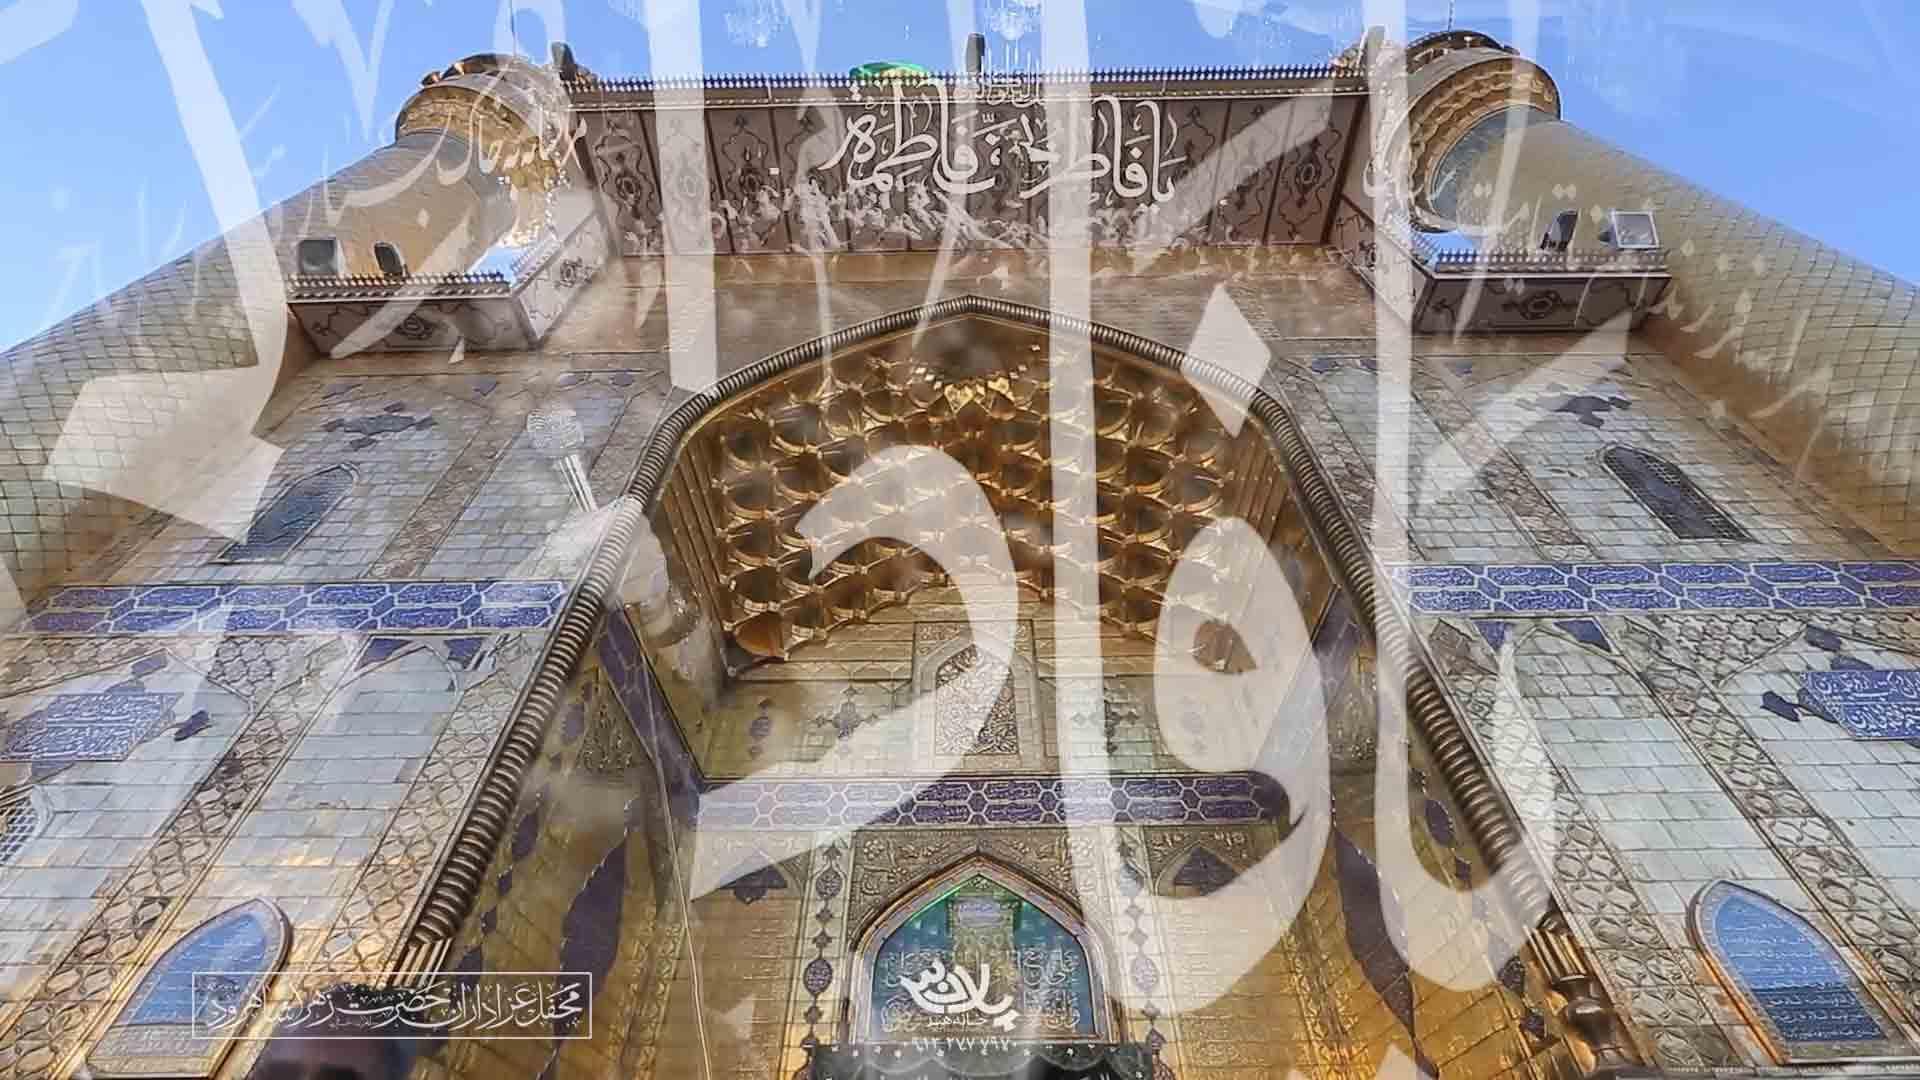 السلام علی سیدالابرار محمدحسین حدادیان